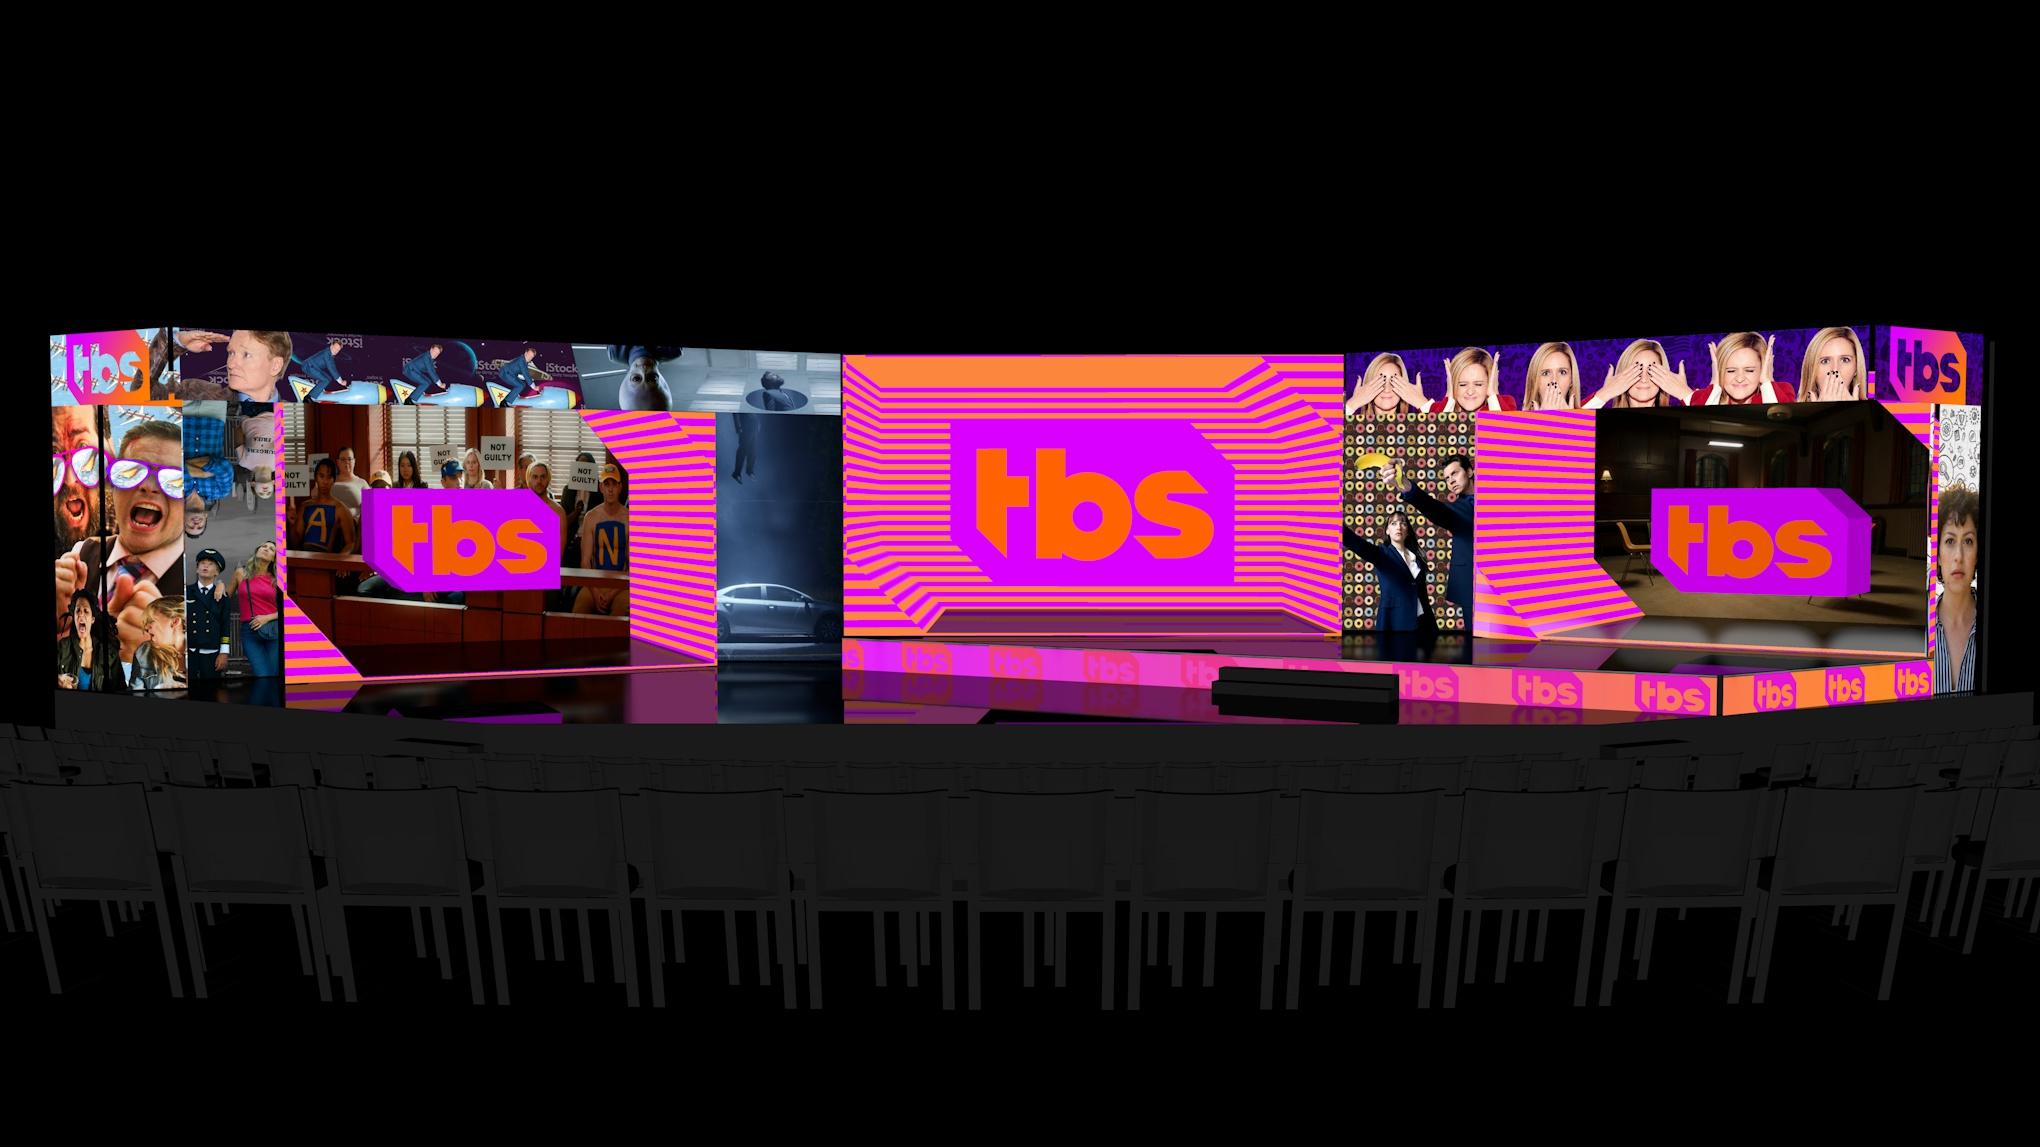 TBS_Returning_Shows_0001.jpg